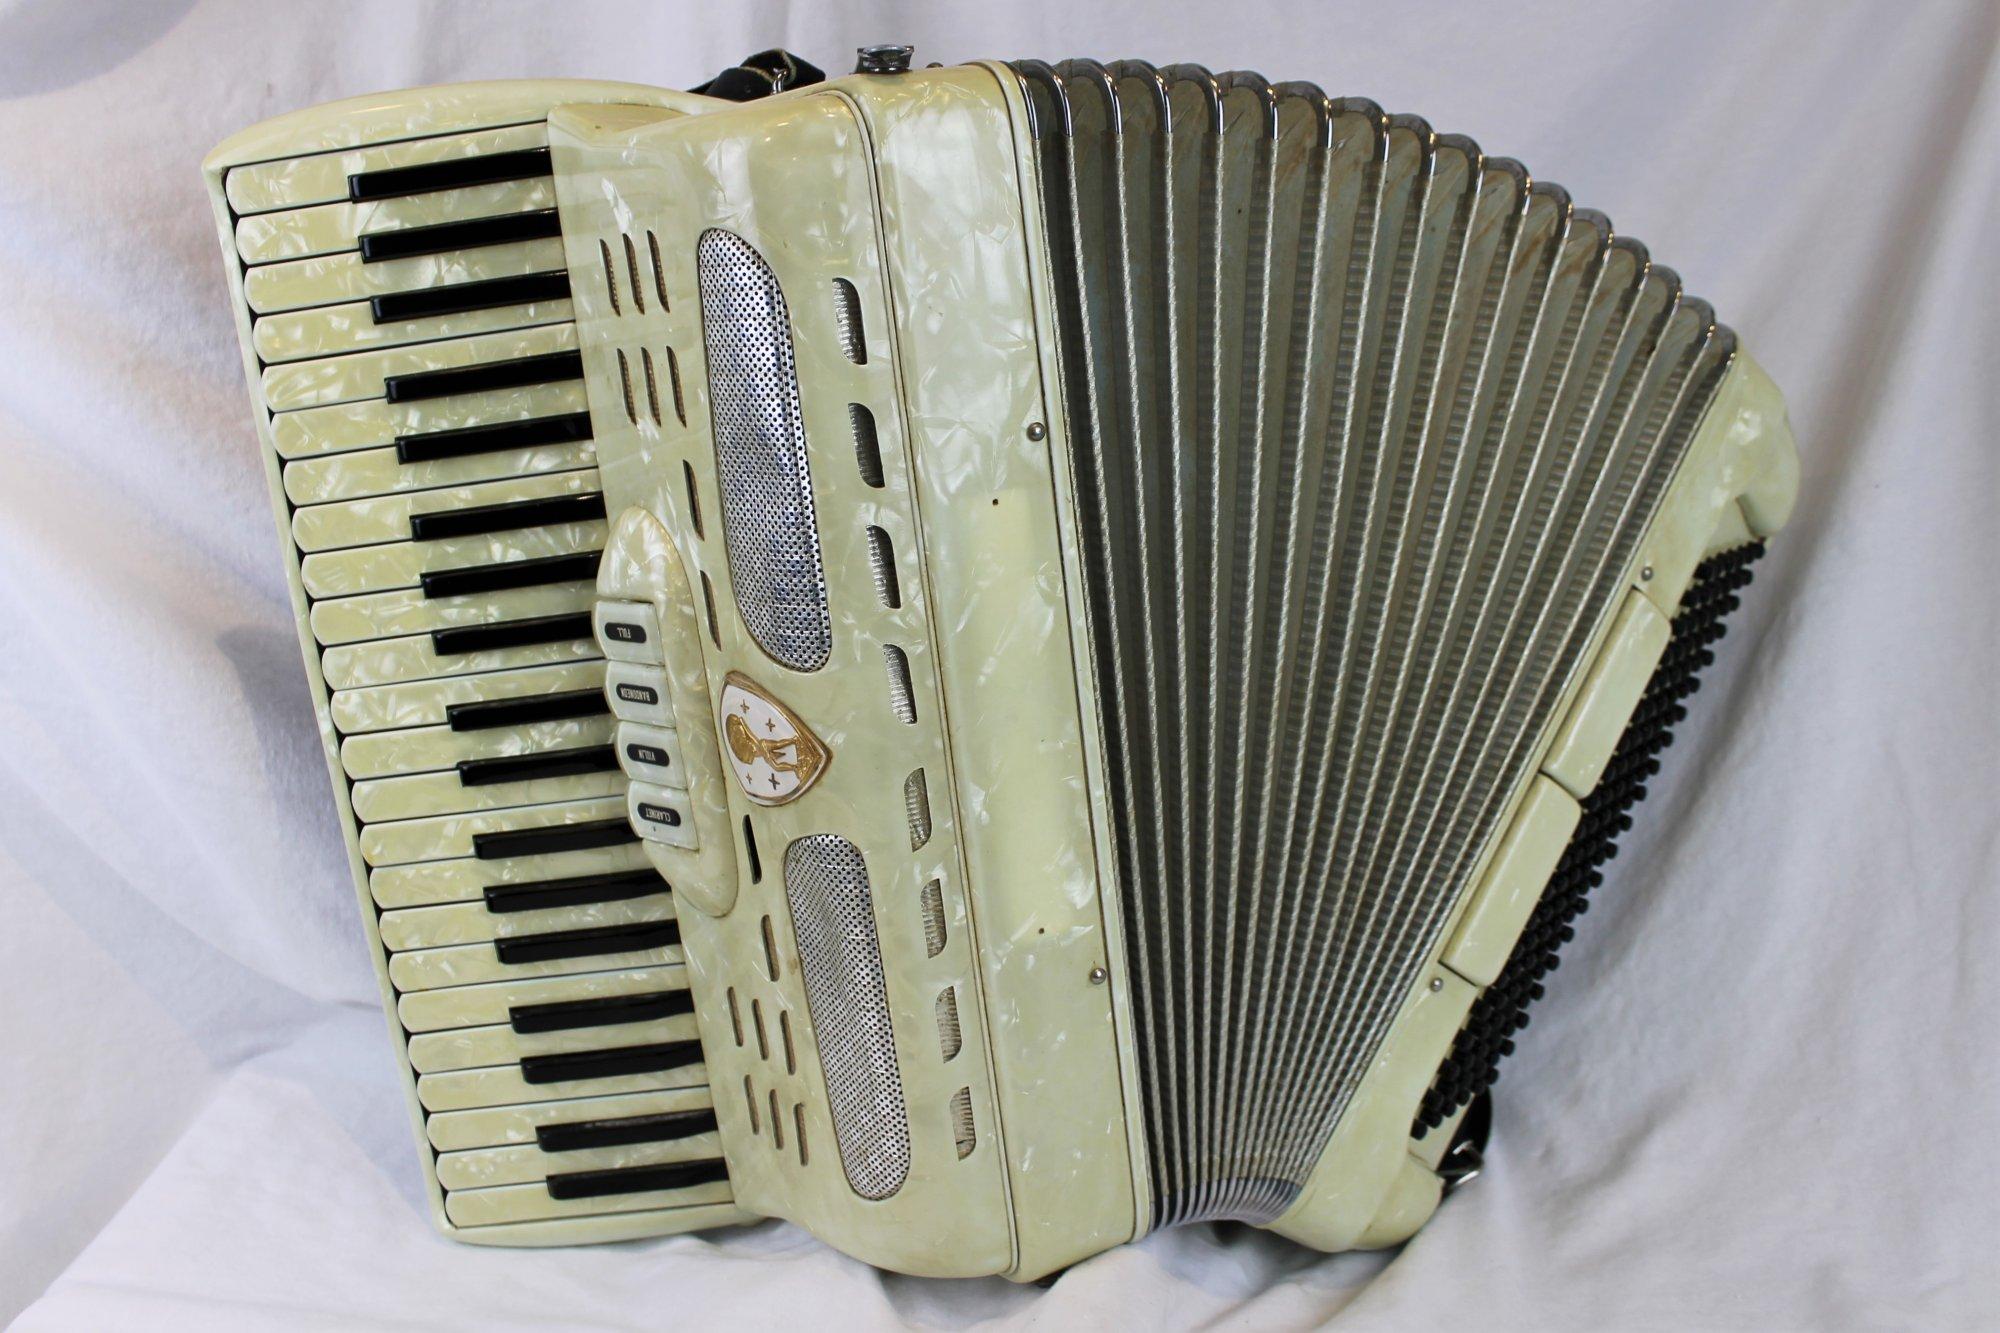 4666 - Ivory Atlas Piano Accordion LMM 41 120